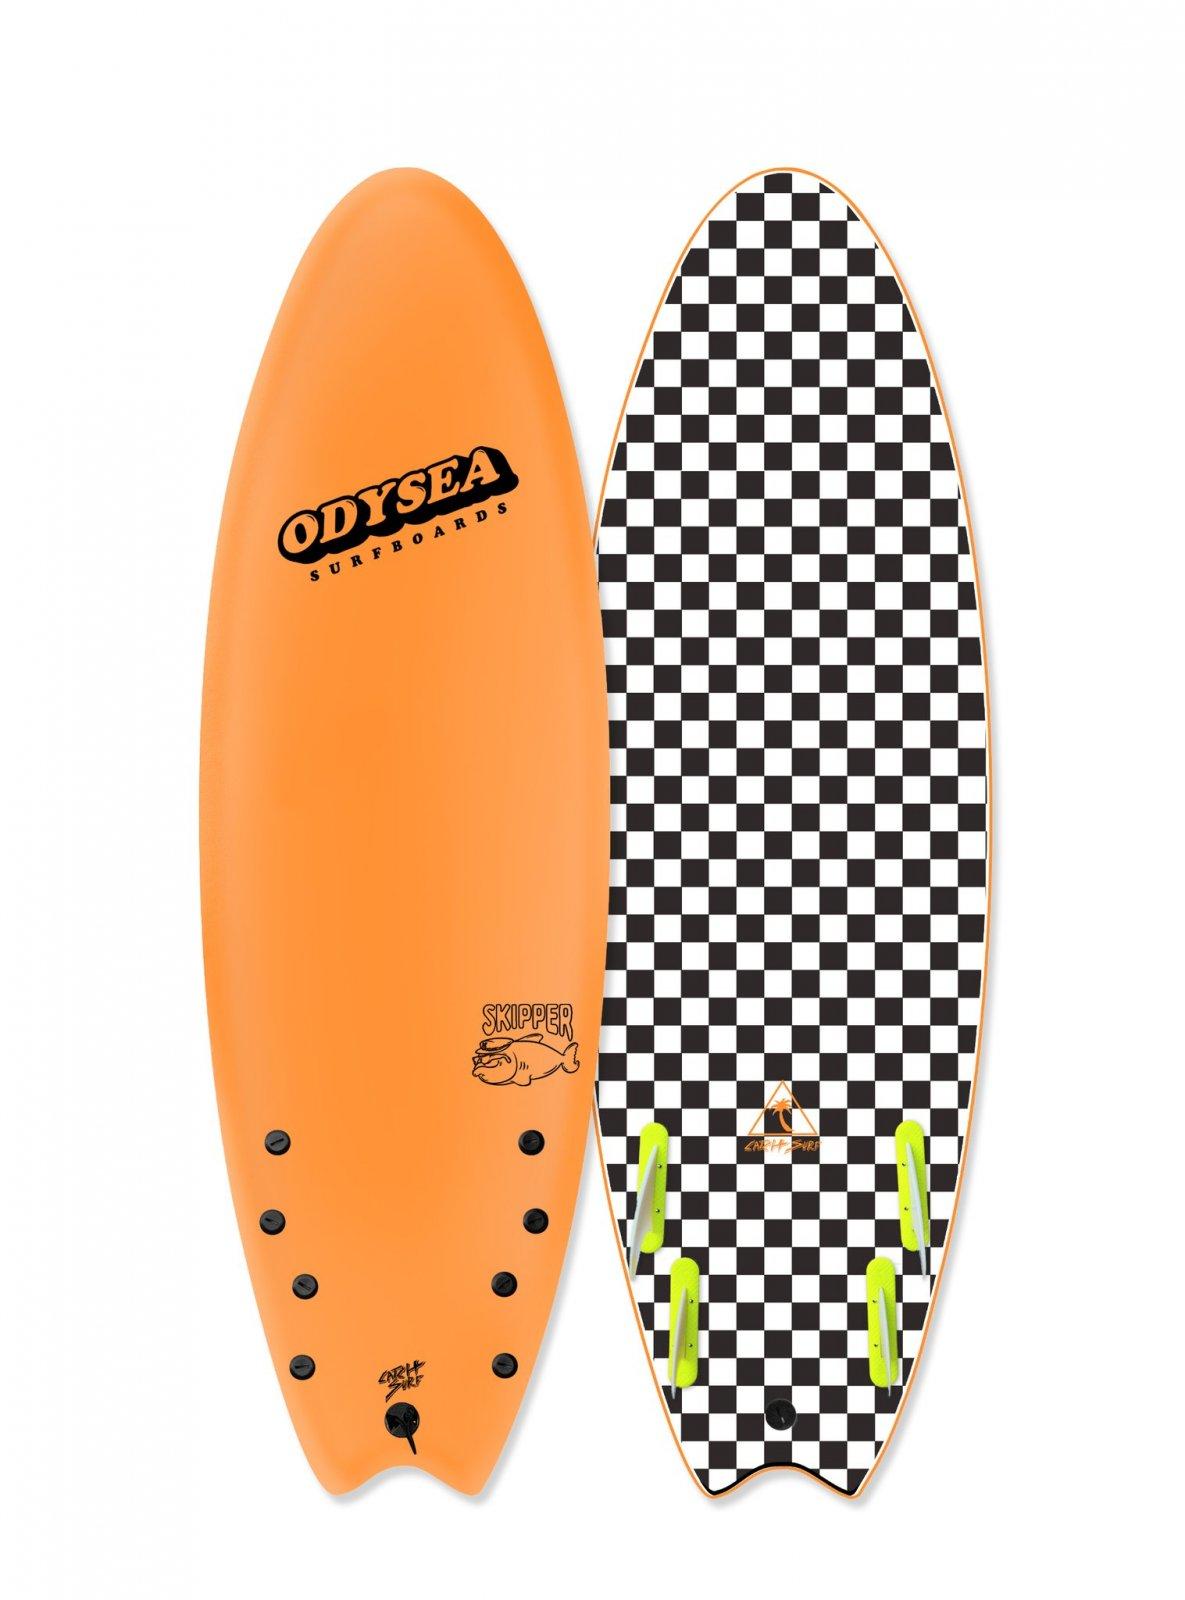 Odysea 6'0 Skipper- Quad